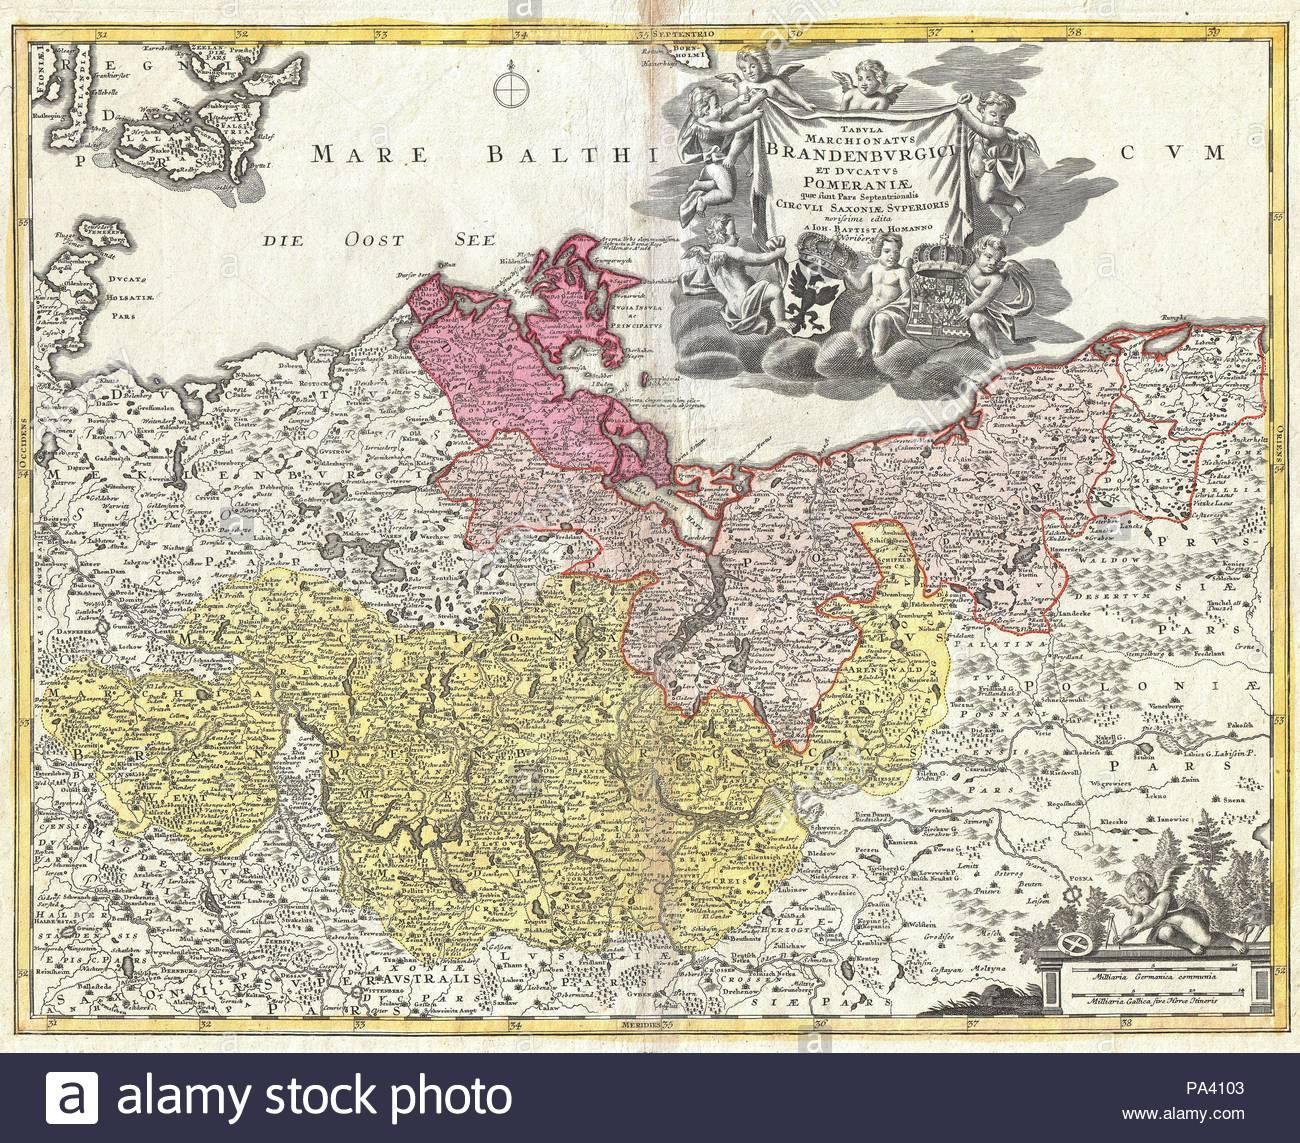 1720 Homann Map Of Brandenberg And Pomerania Germany Stock Photo